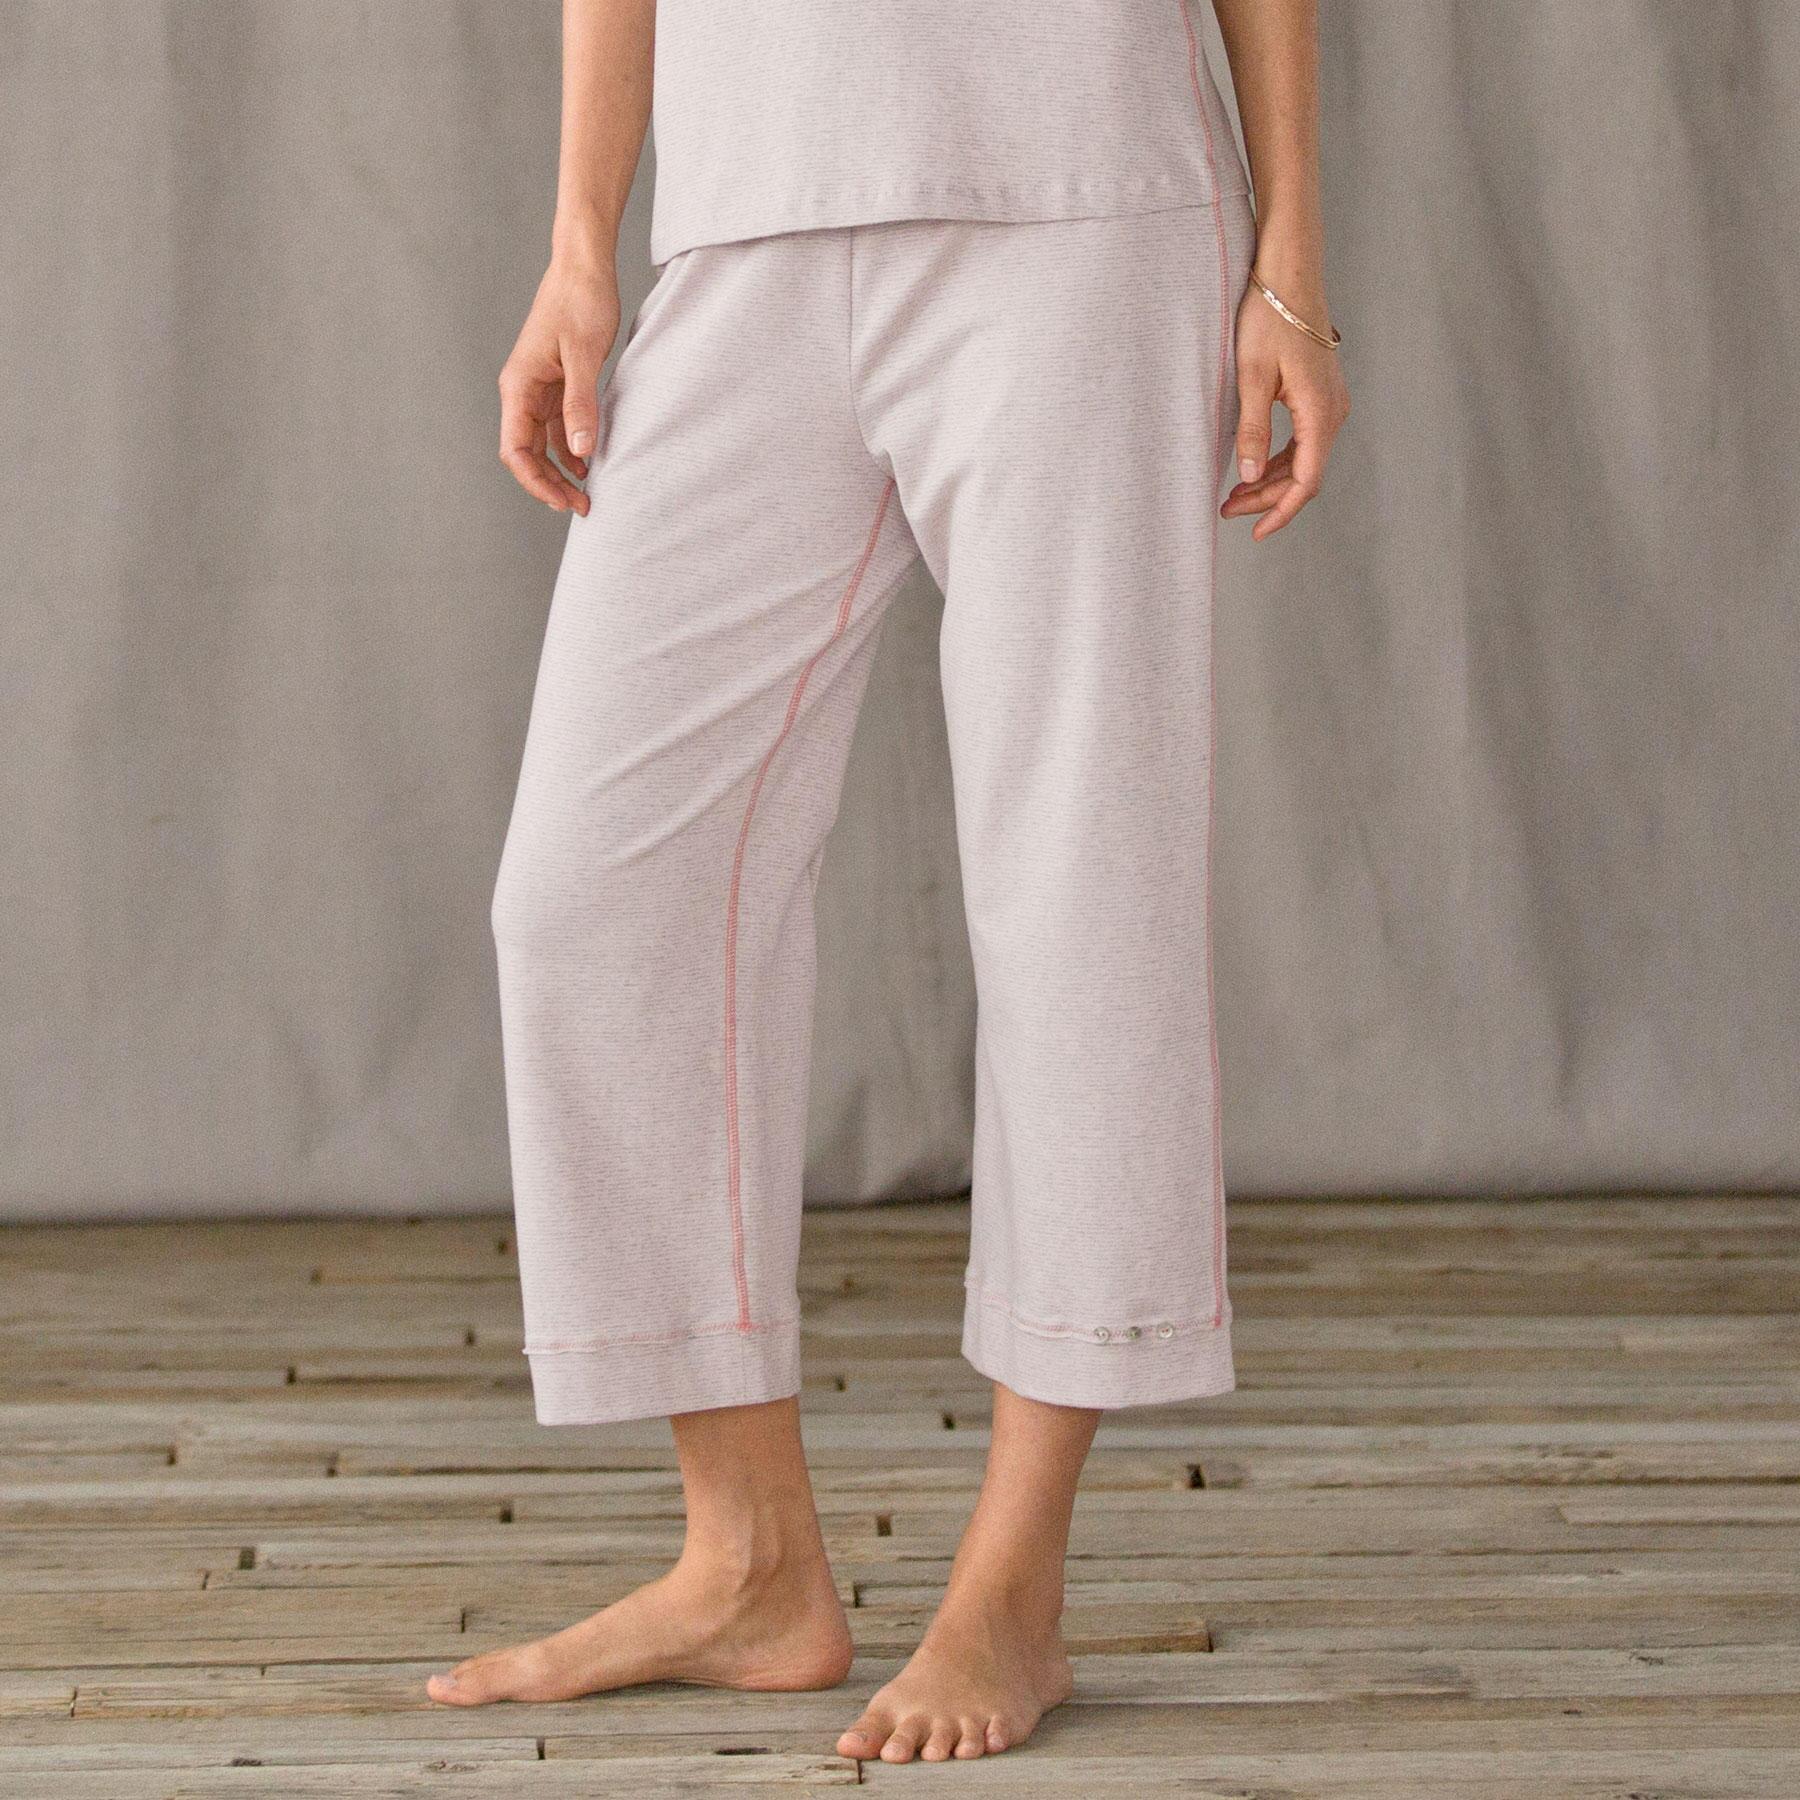 SLEEP TIGHT CROPPED PJ PANTS: View 1